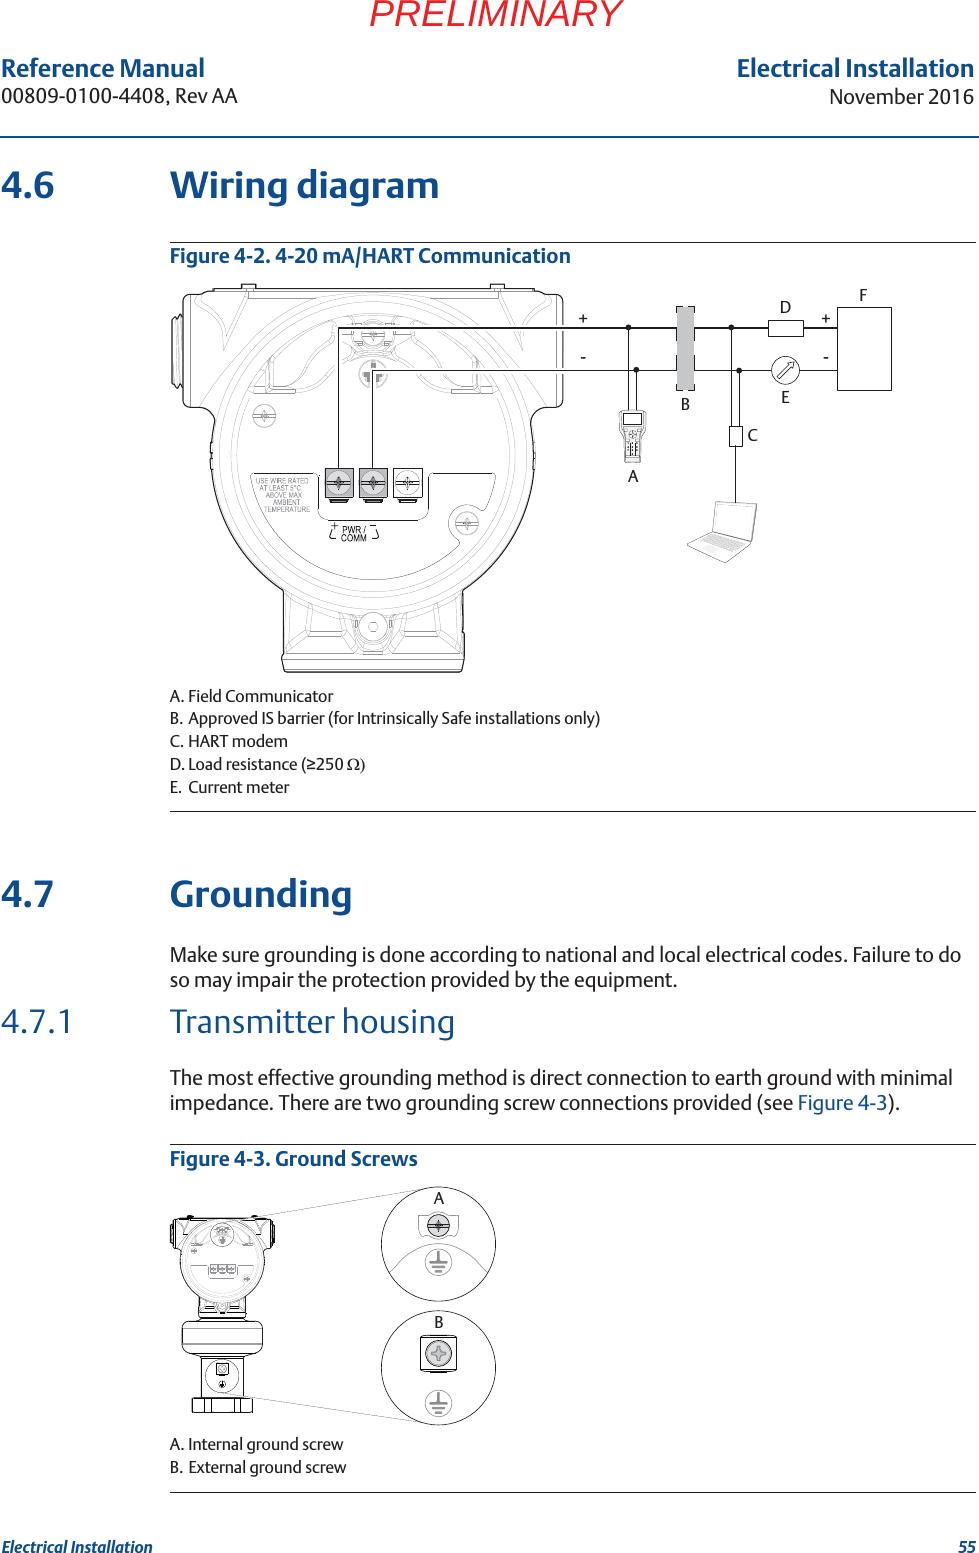 Rosemount Tank Radar 5408t 5408 Level Transmitter User Manual Intrinsically Safe Wiring 55reference 00809 0100 4408 Rev Aaelectrical Installationnovember 2016electrical Installationpreliminary46